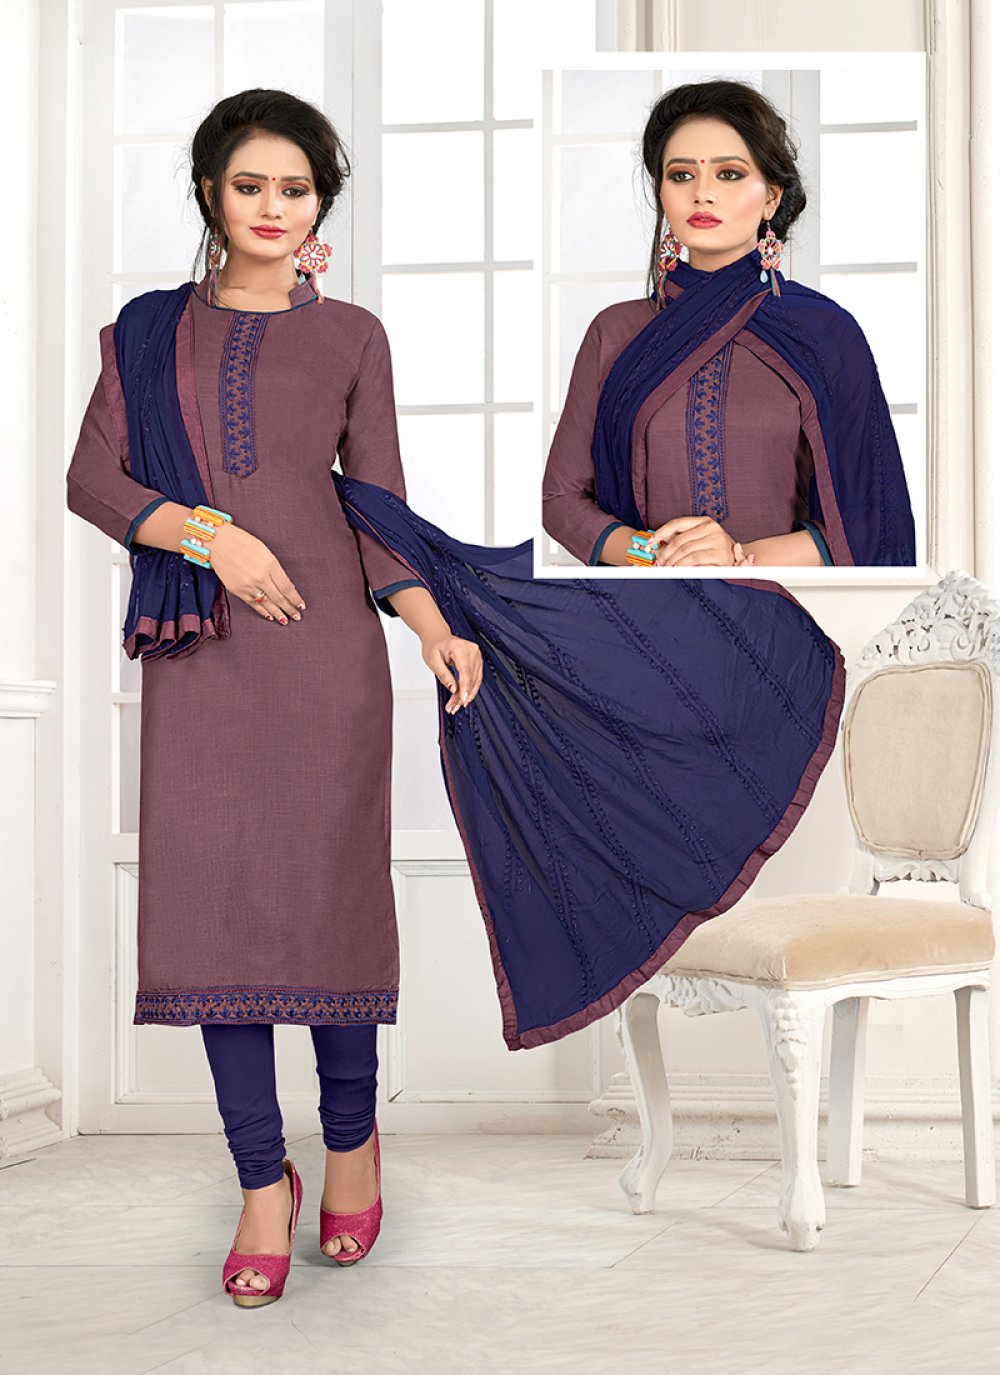 Cotton Blue and Mauve  Embroidered Churidar Salwar Kameez